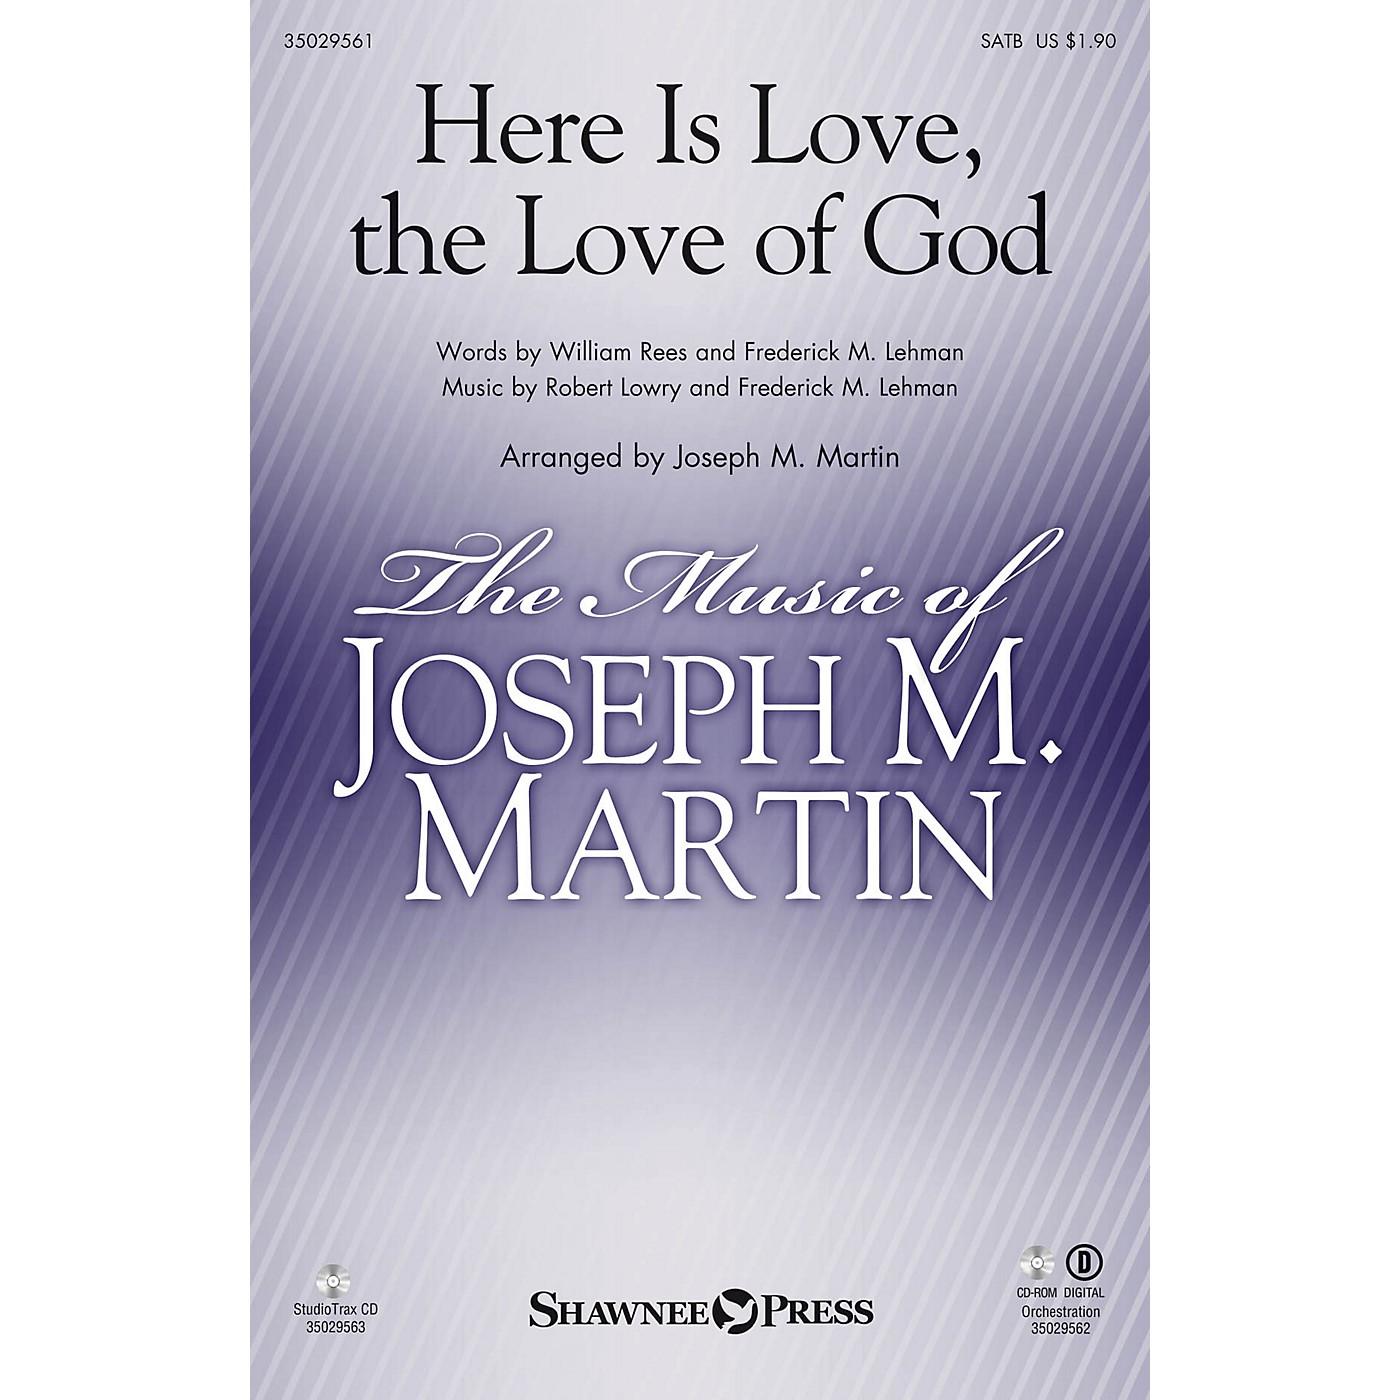 Shawnee Press Here Is Love, the Love of God Studiotrax CD Arranged by Joseph M. Martin thumbnail